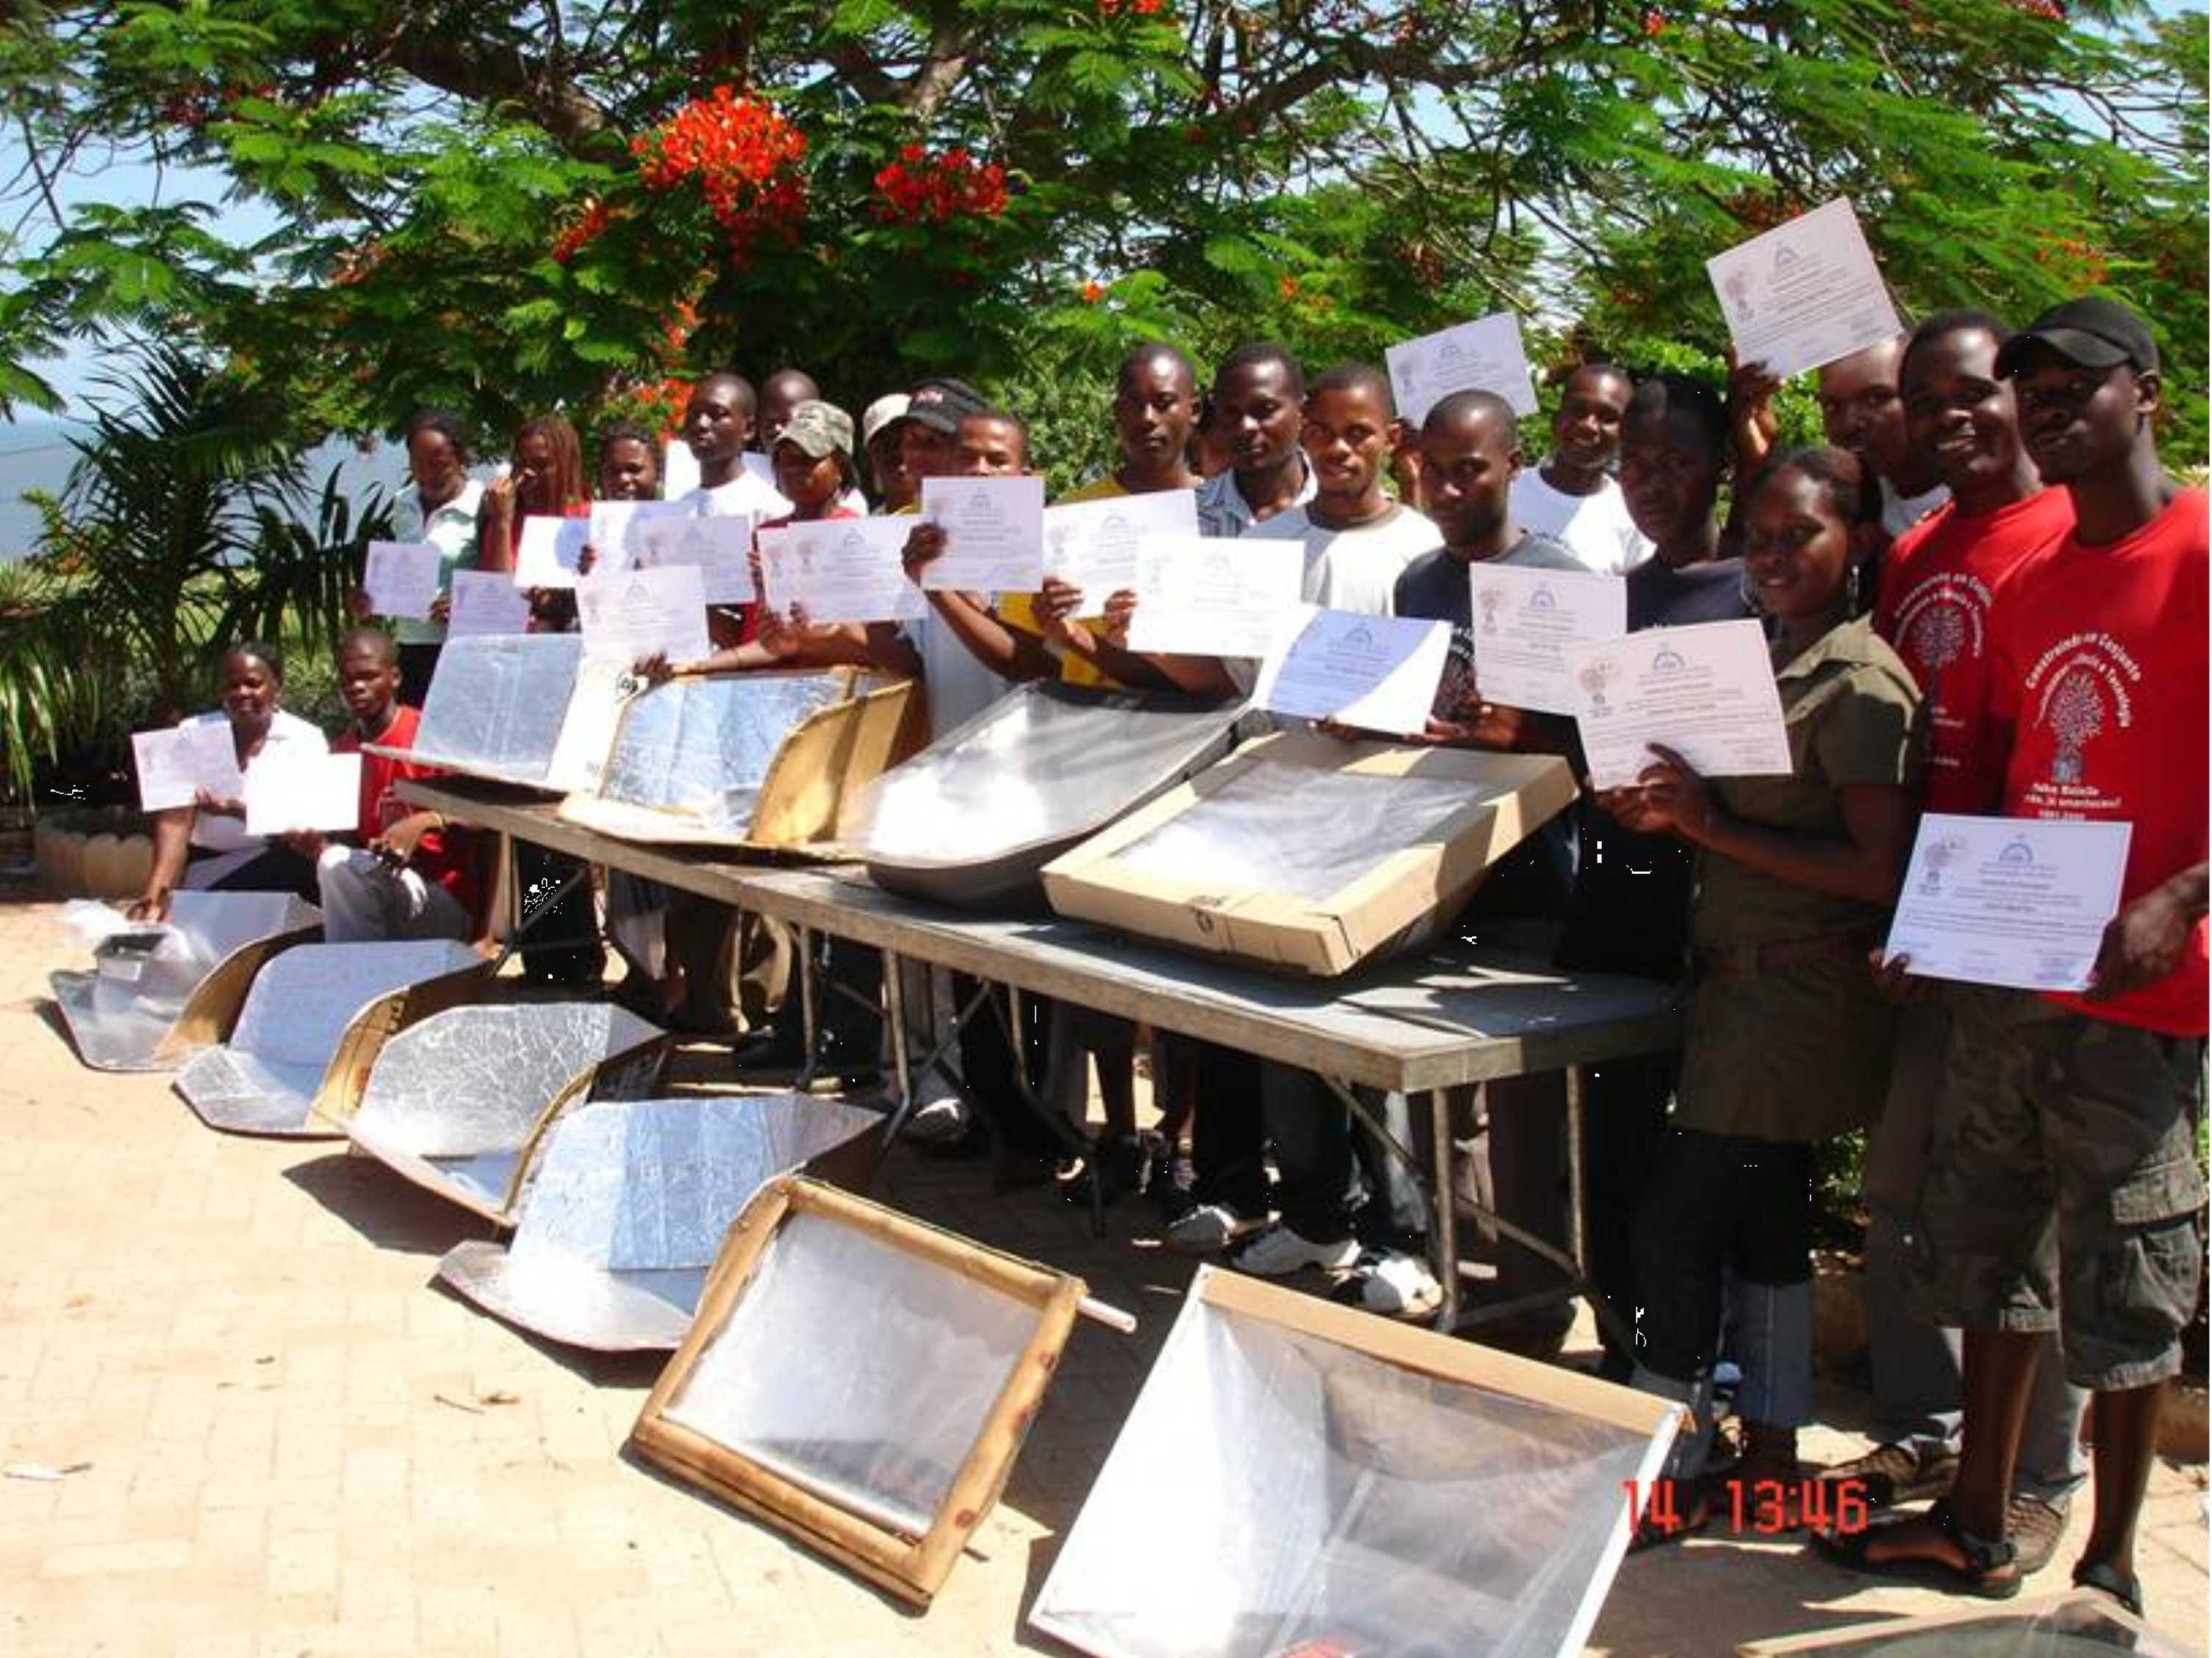 Mozambique Association for Urban Development